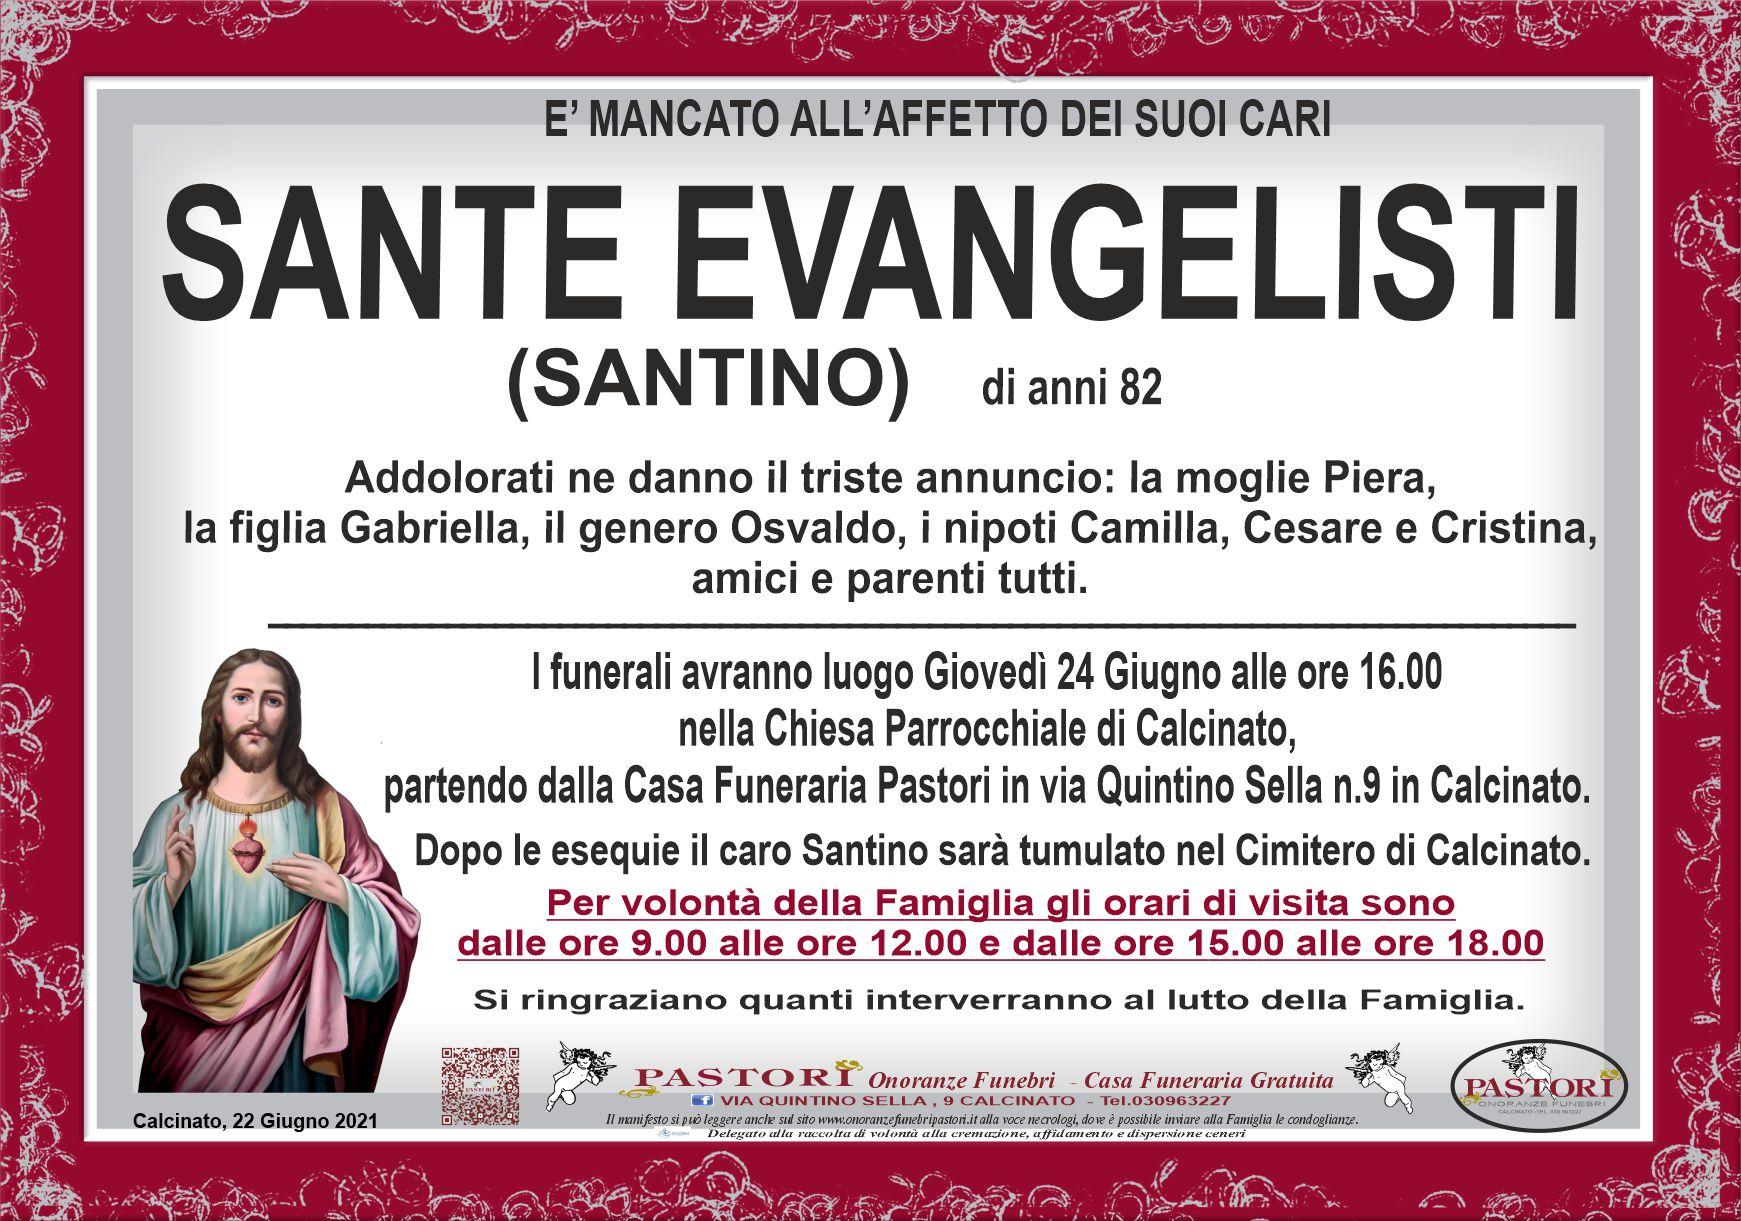 Sante Evangelisti